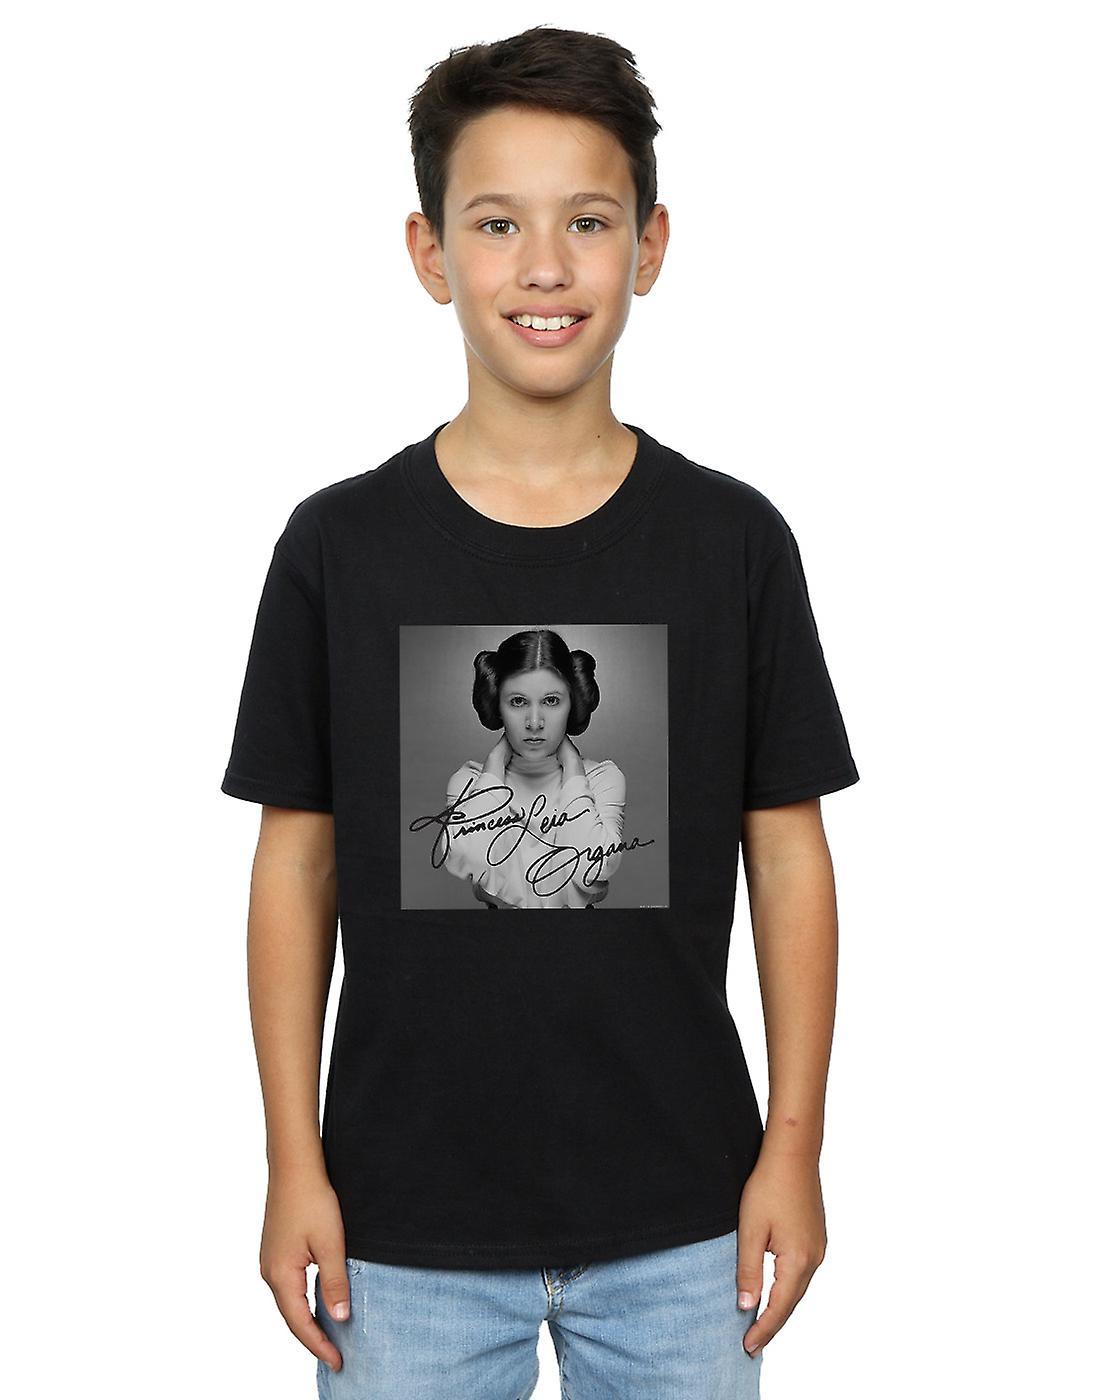 Star Wars Boys Princess Leia Organa T-Shirt